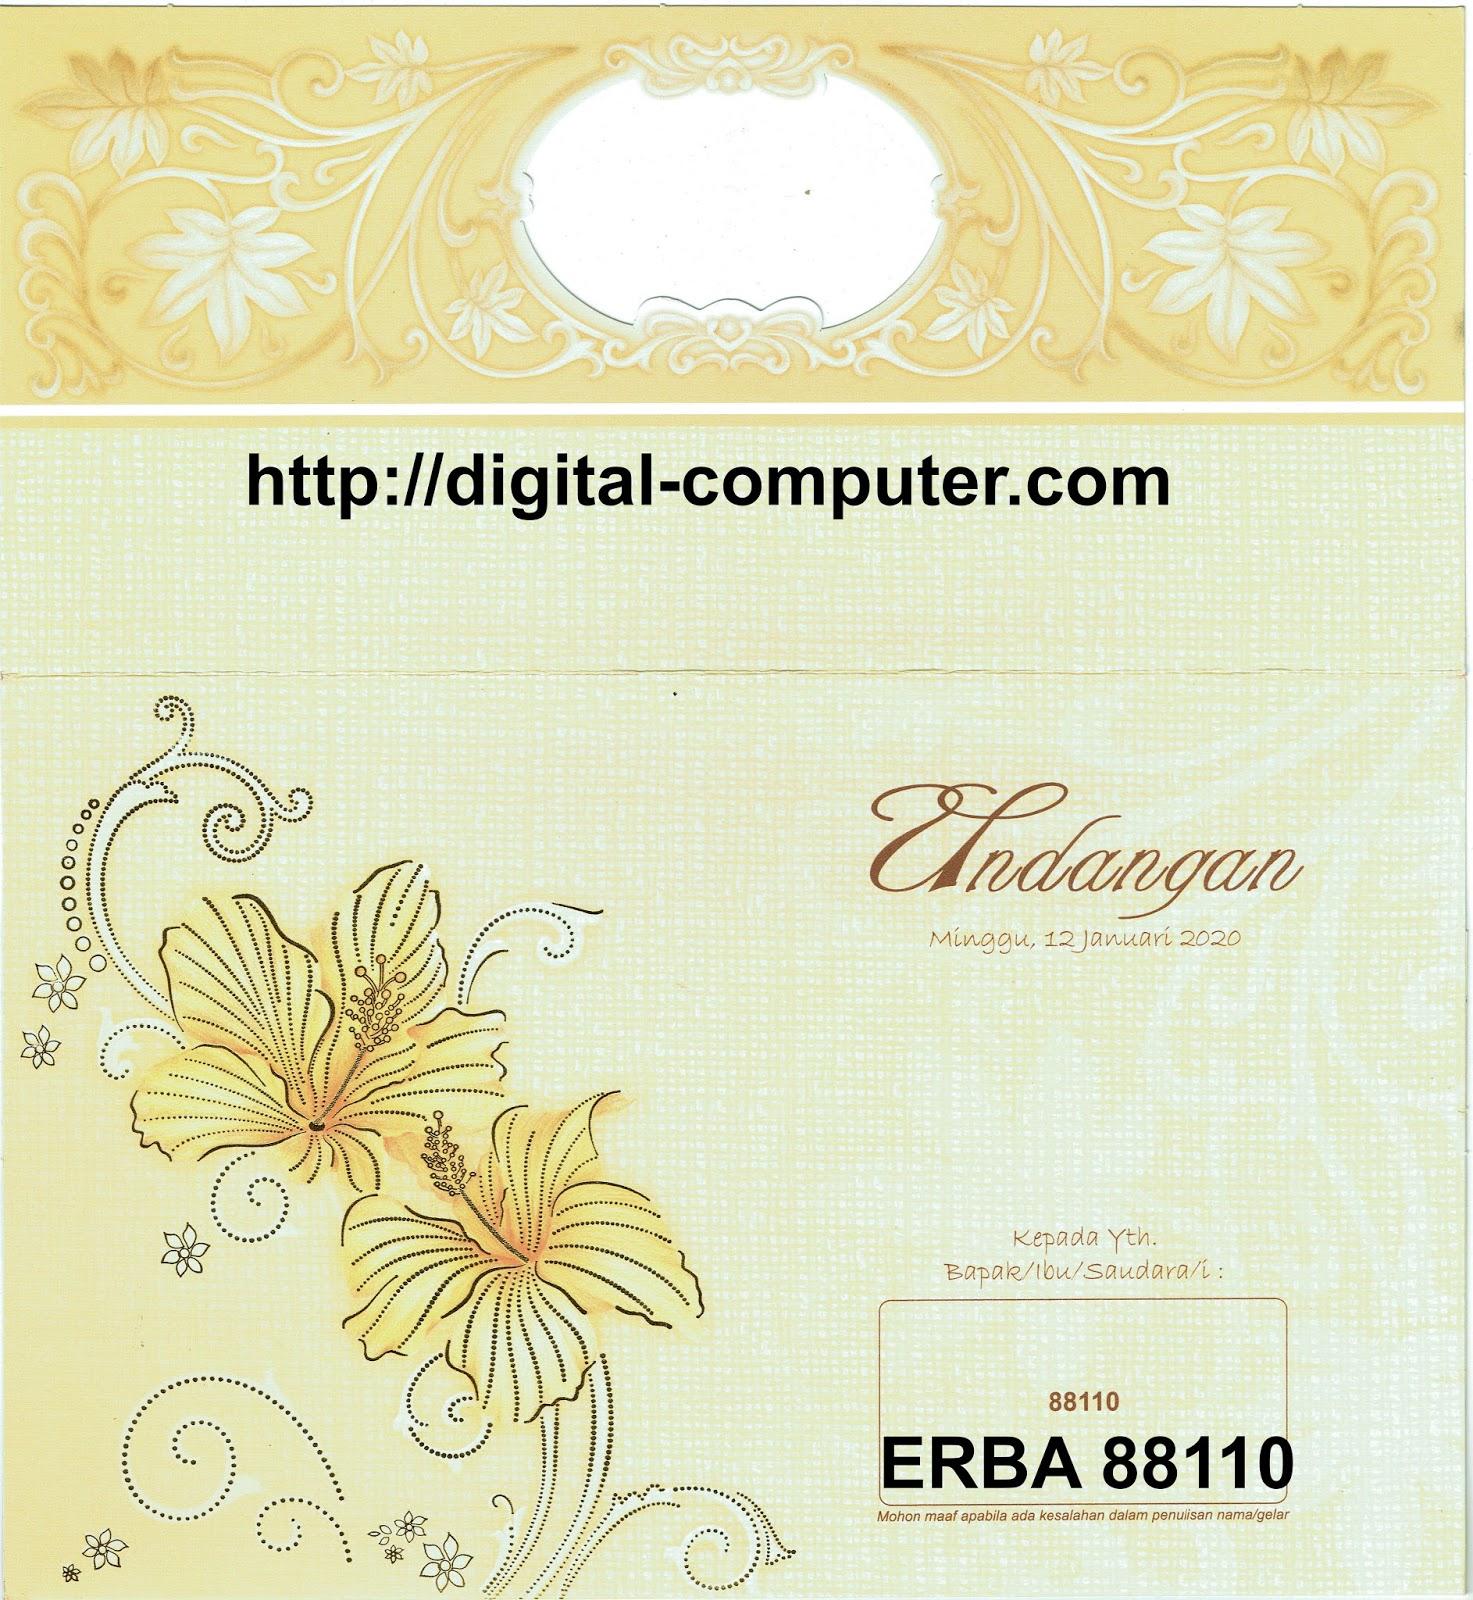 Undangan Softcover ERBA 88110